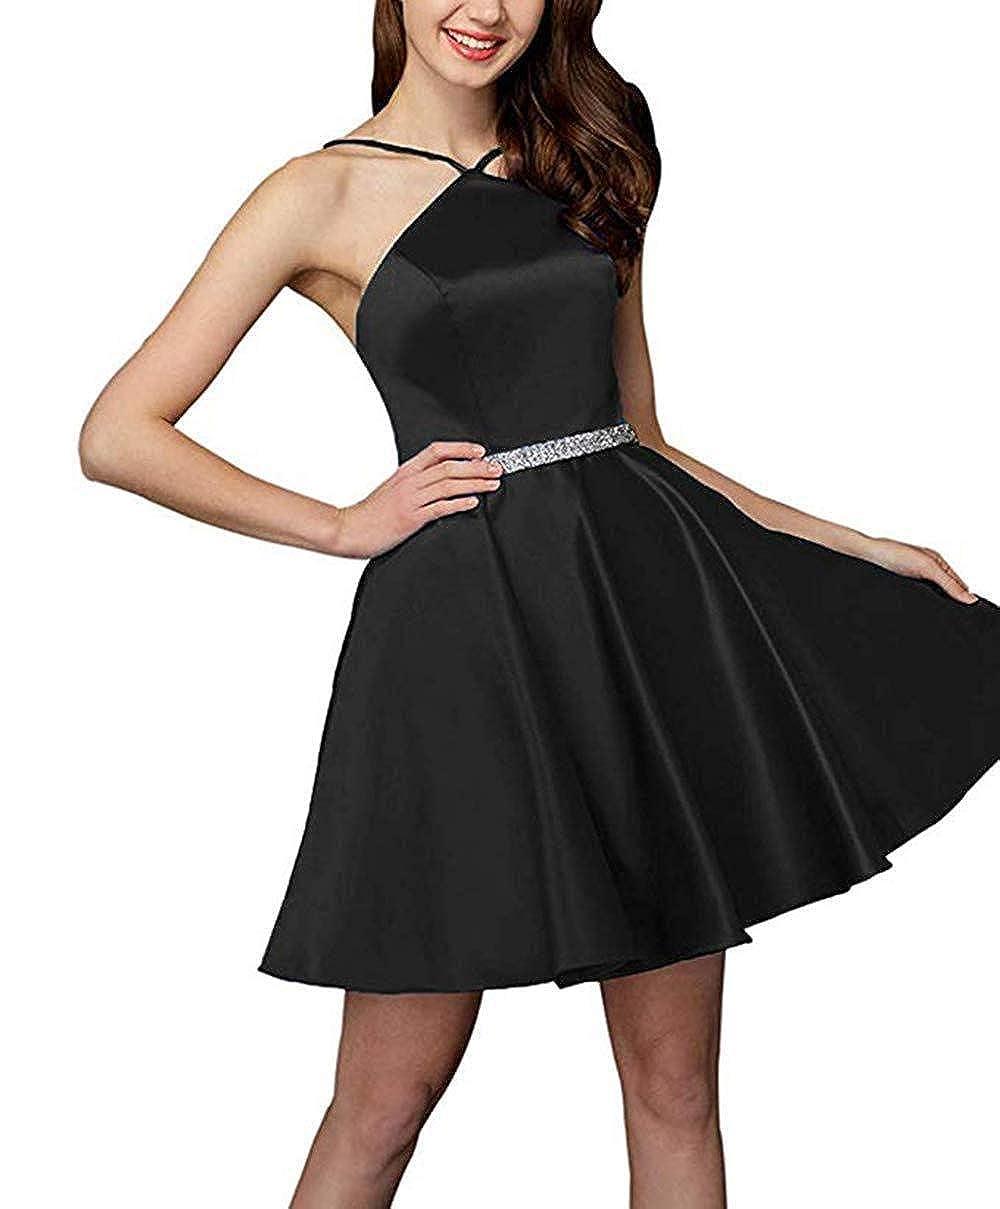 Black XingMeng A Line Short Homecoming Dress 2018 Beaed Halter Mini Prom Cocktail Dress